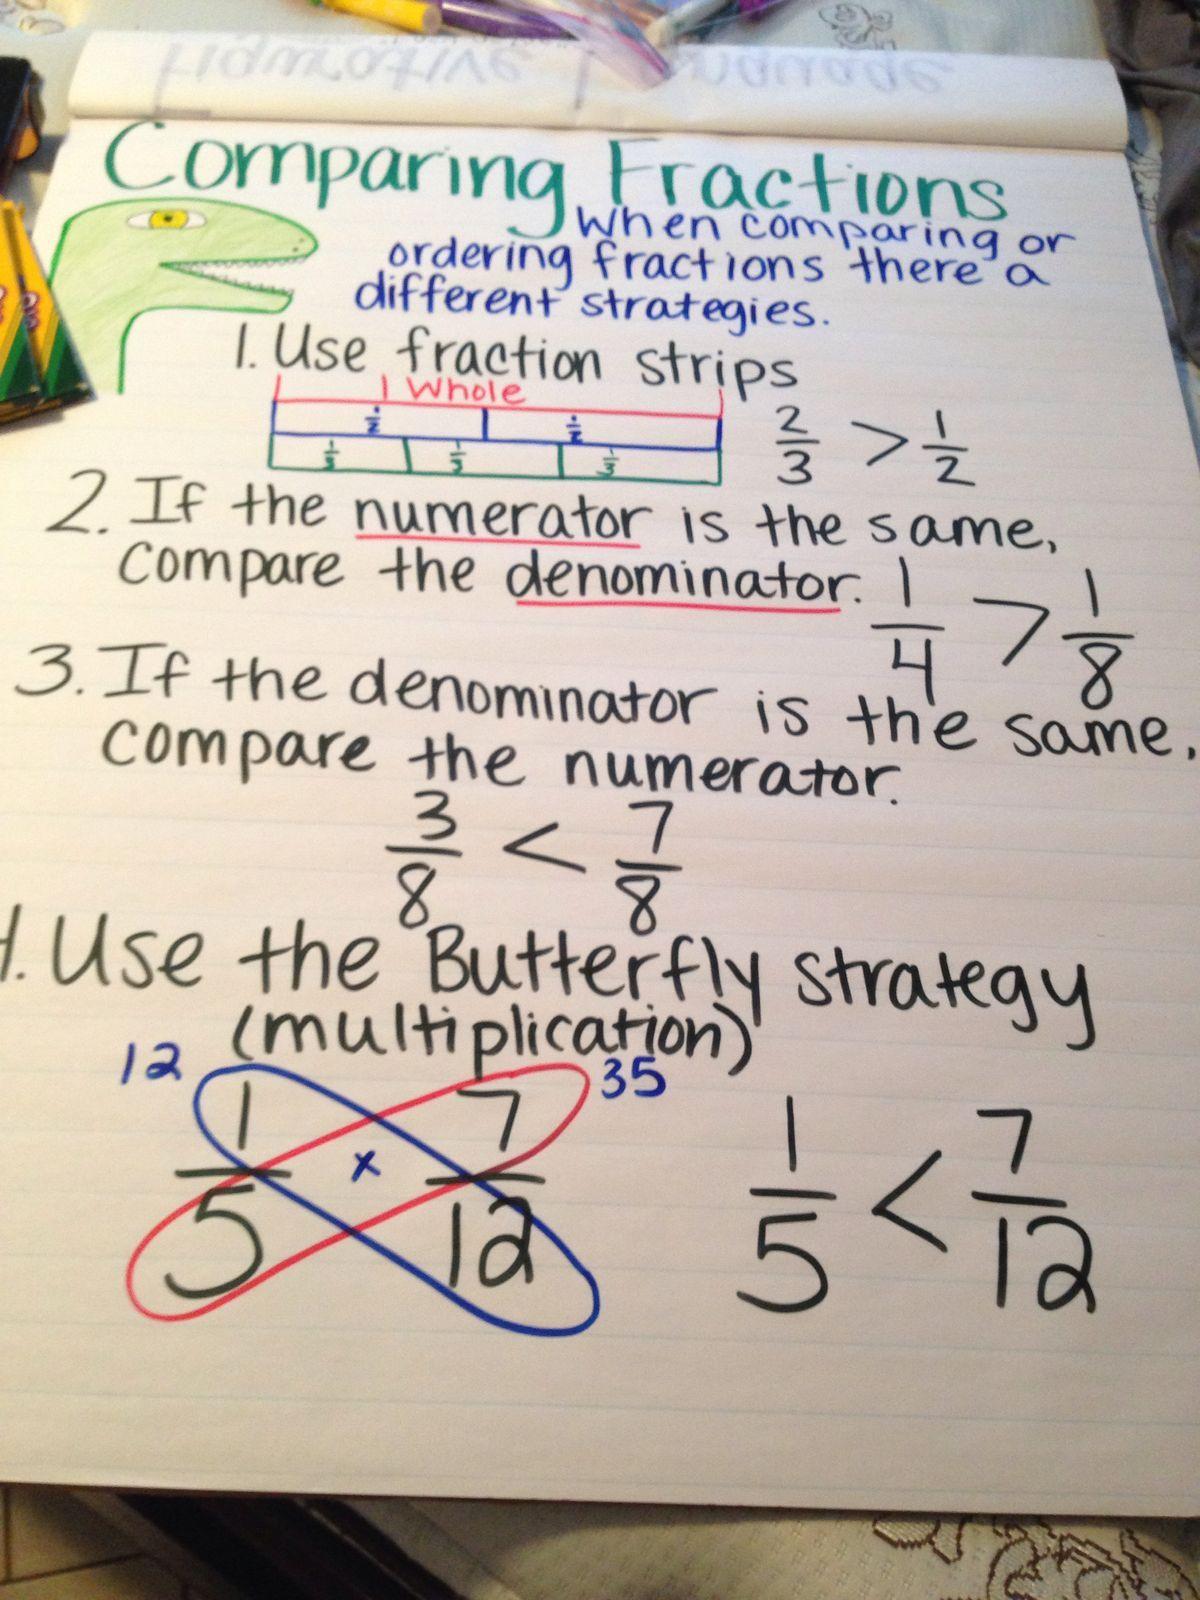 pin by amanda mayo on school: math | pinterest | fractions, math and